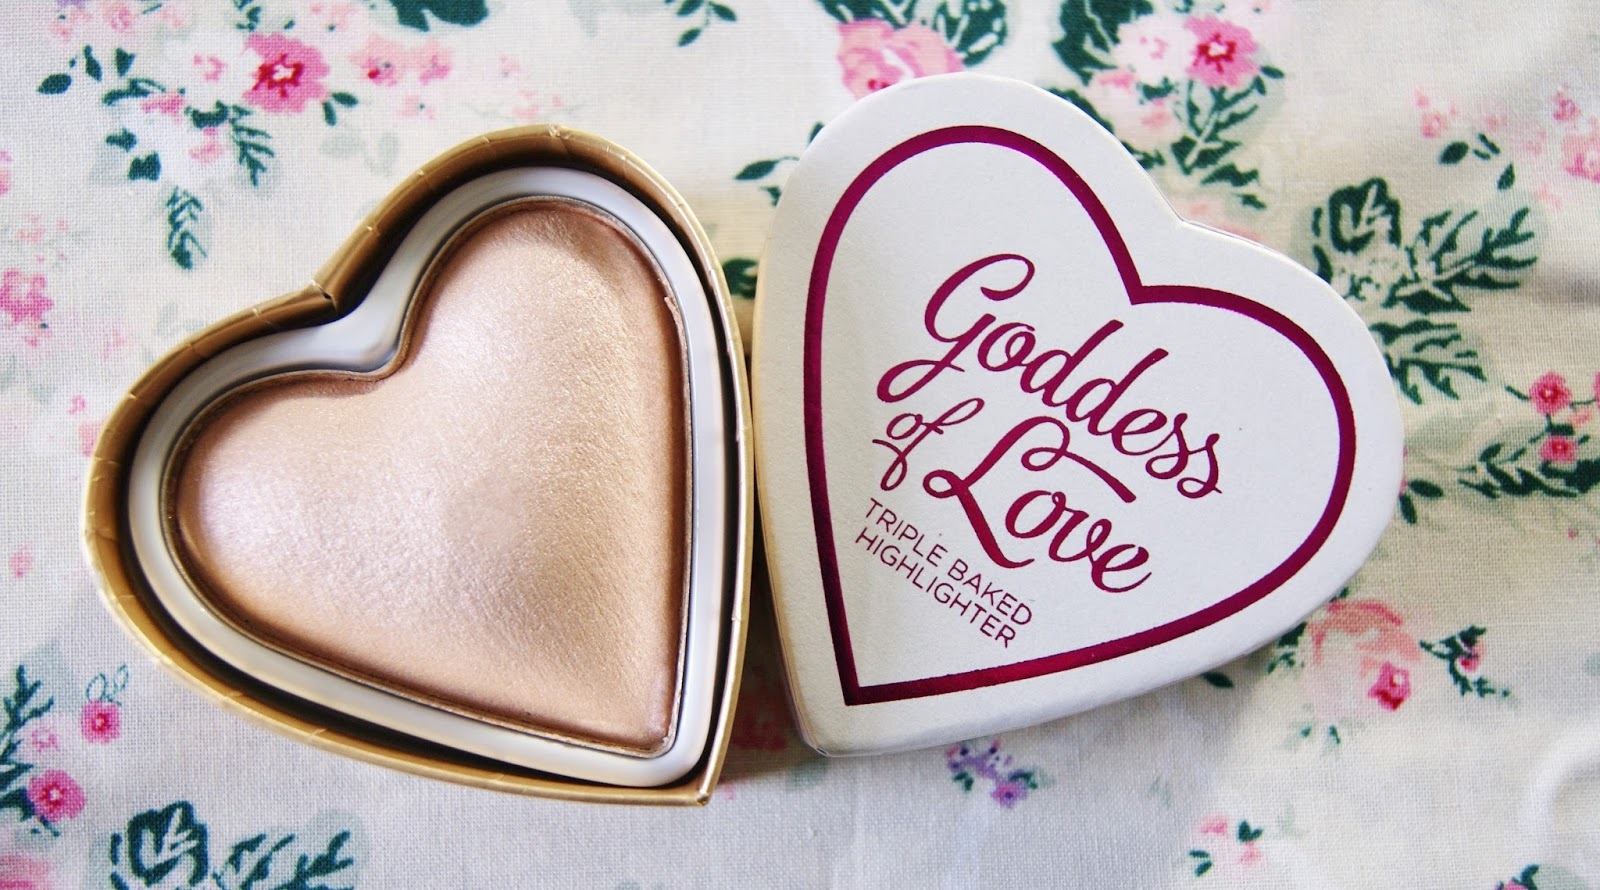 I Heart Makeup Goddess of Love Highlighter